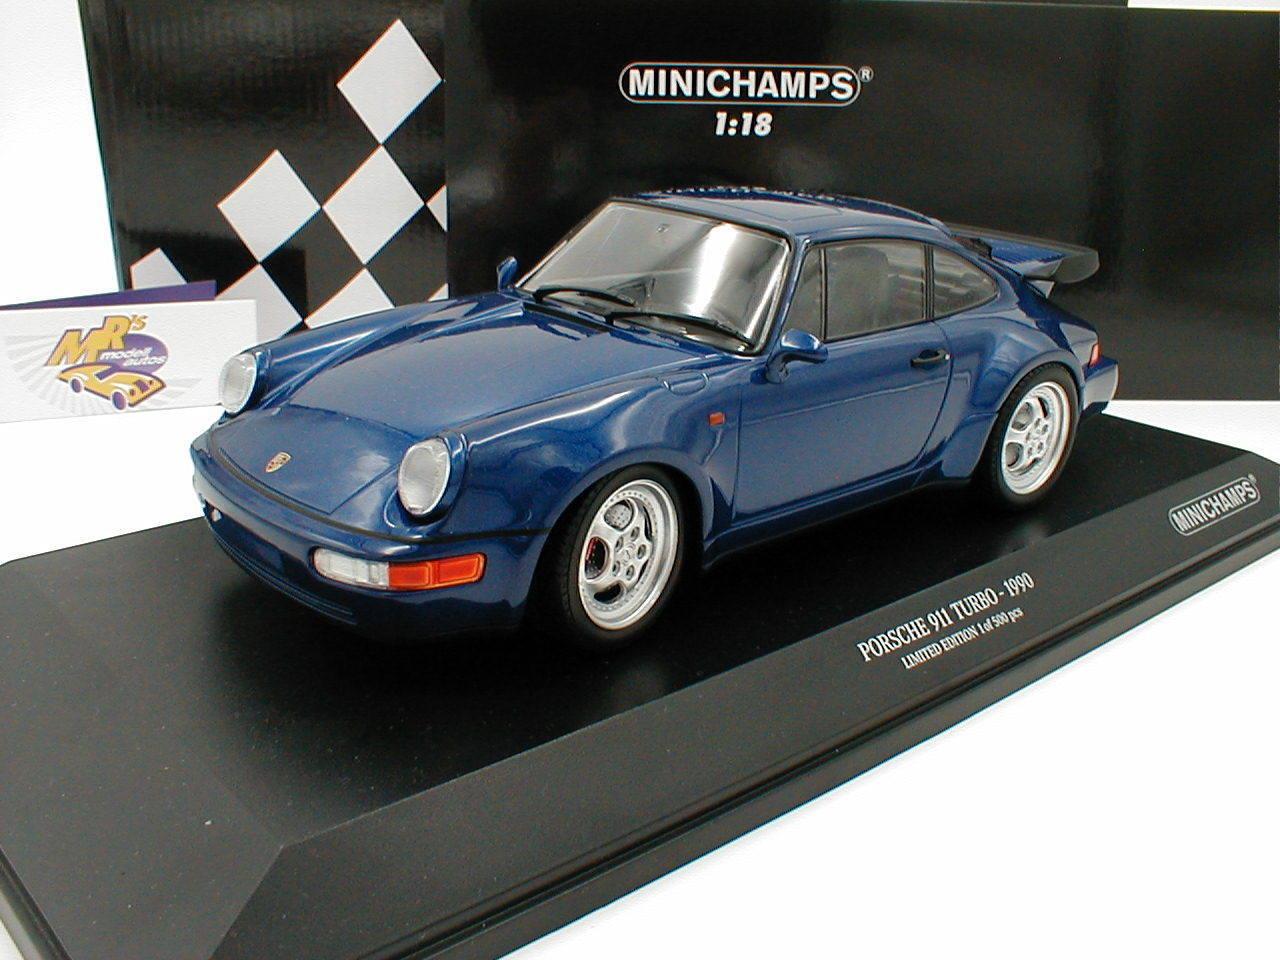 MINICHAMPS 155069101   Porsche 911 Turbo Année de fabrication 1990 in  bleumetallic  1 18